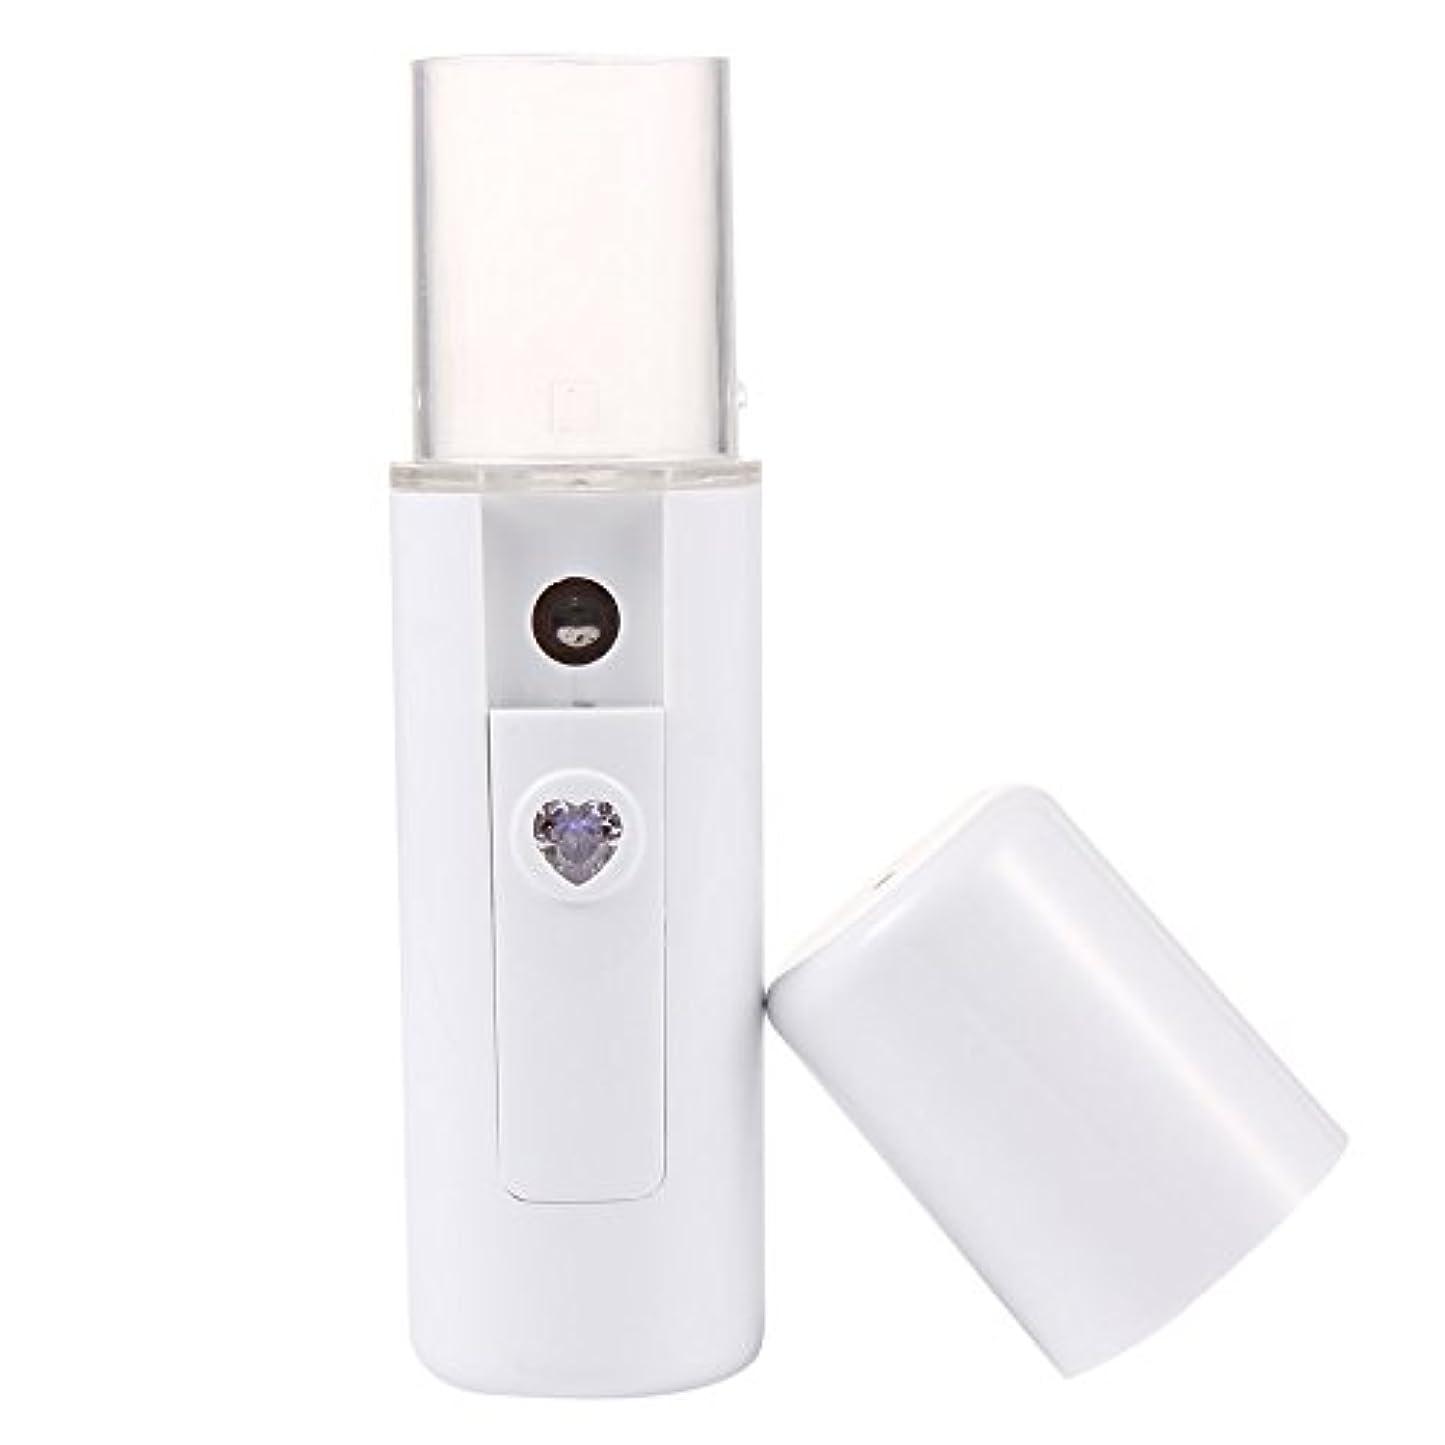 L3 USB充電式ウォータースプレーポータブルフェイシャルモイスチャライジング美容機器フェイシャルスプレーマシン蒸し装置 - ホワイト